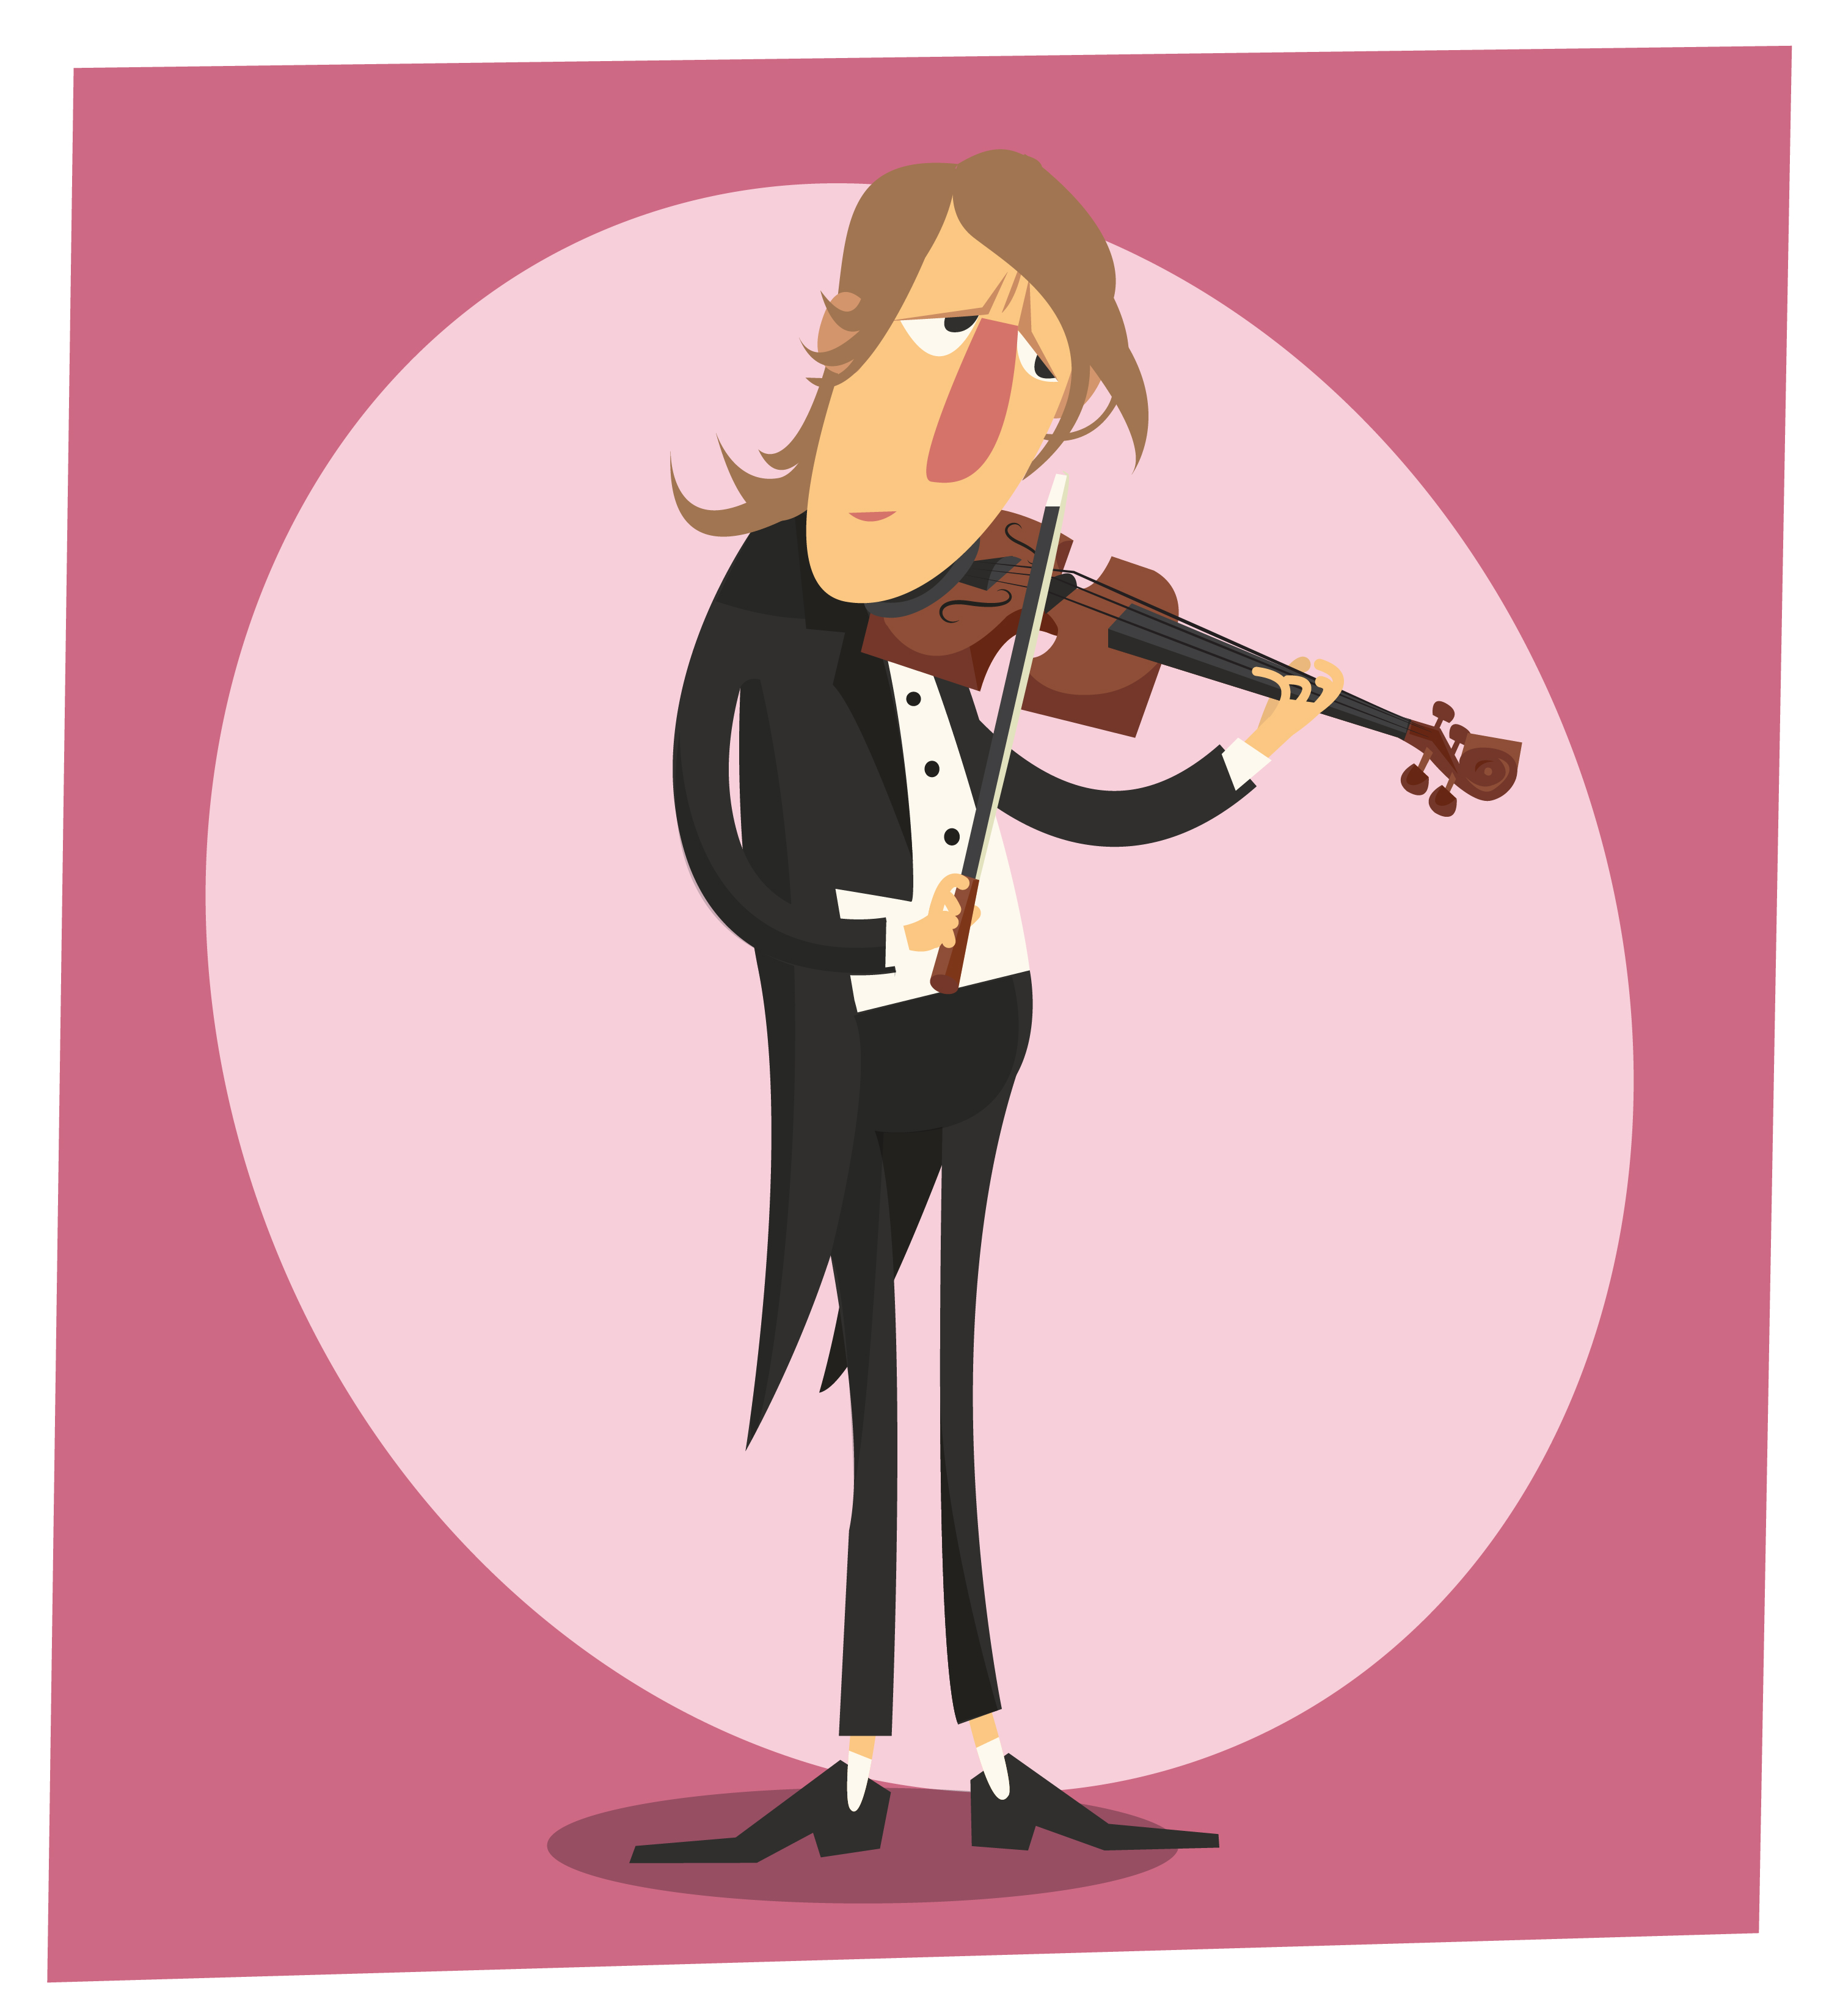 Music cartoon character vector illustration for design Photoshop brush